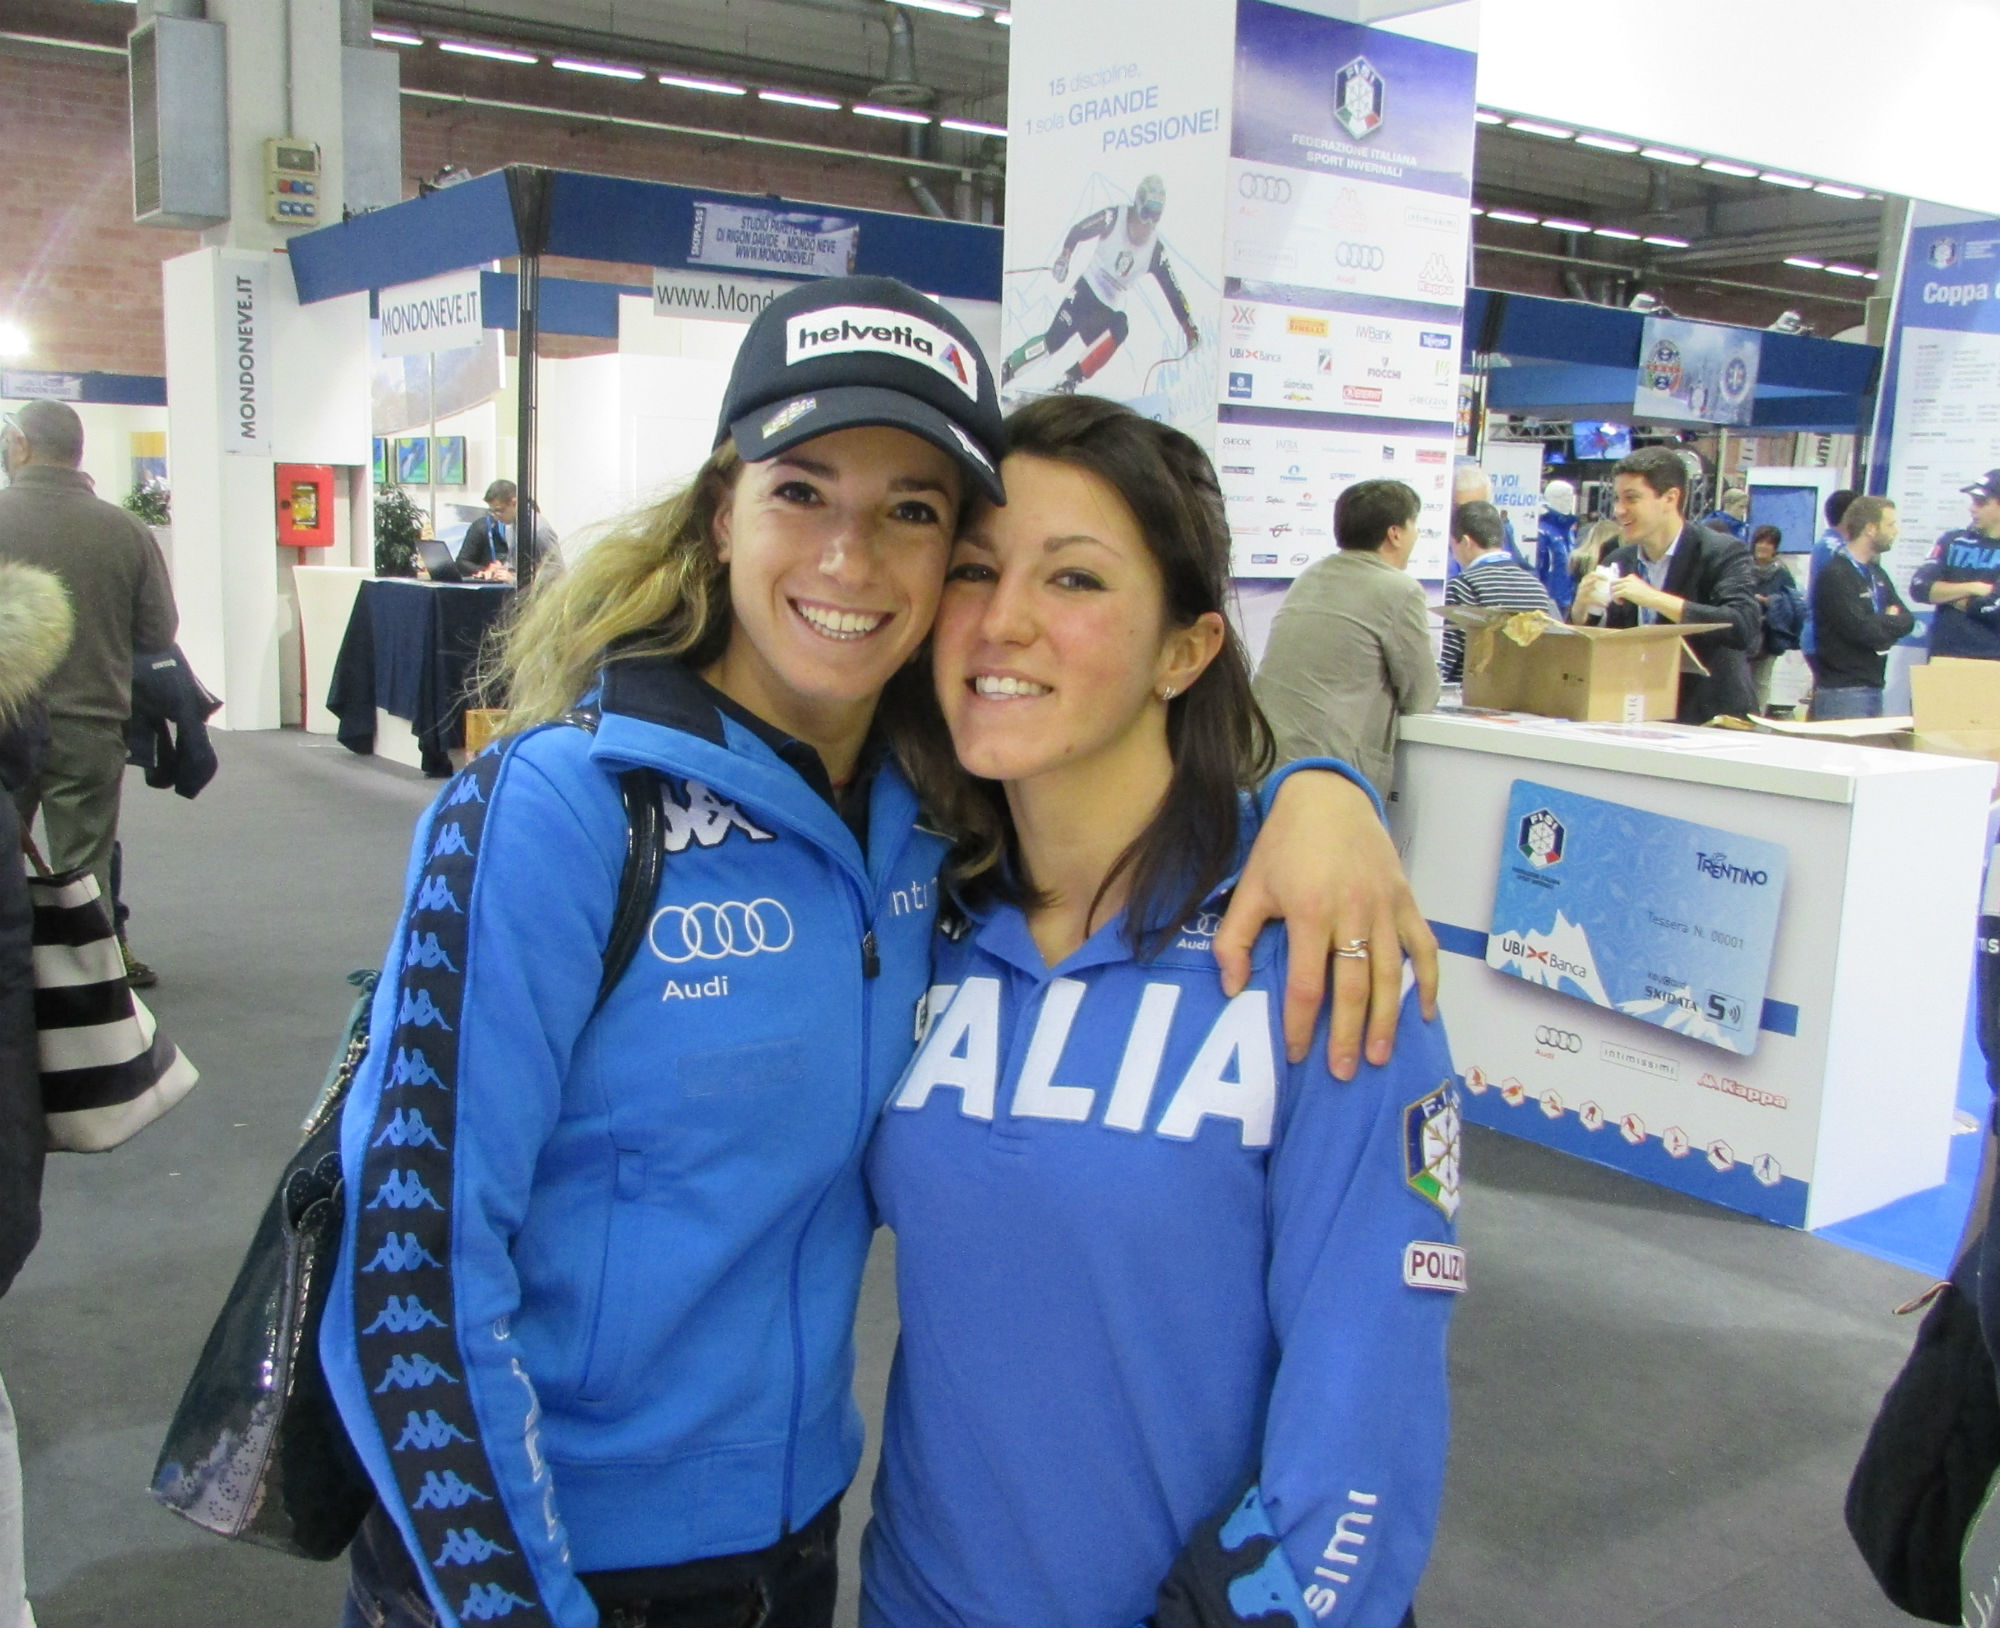 Marta Bassino e Nicole Agnelli a Skipass 2015